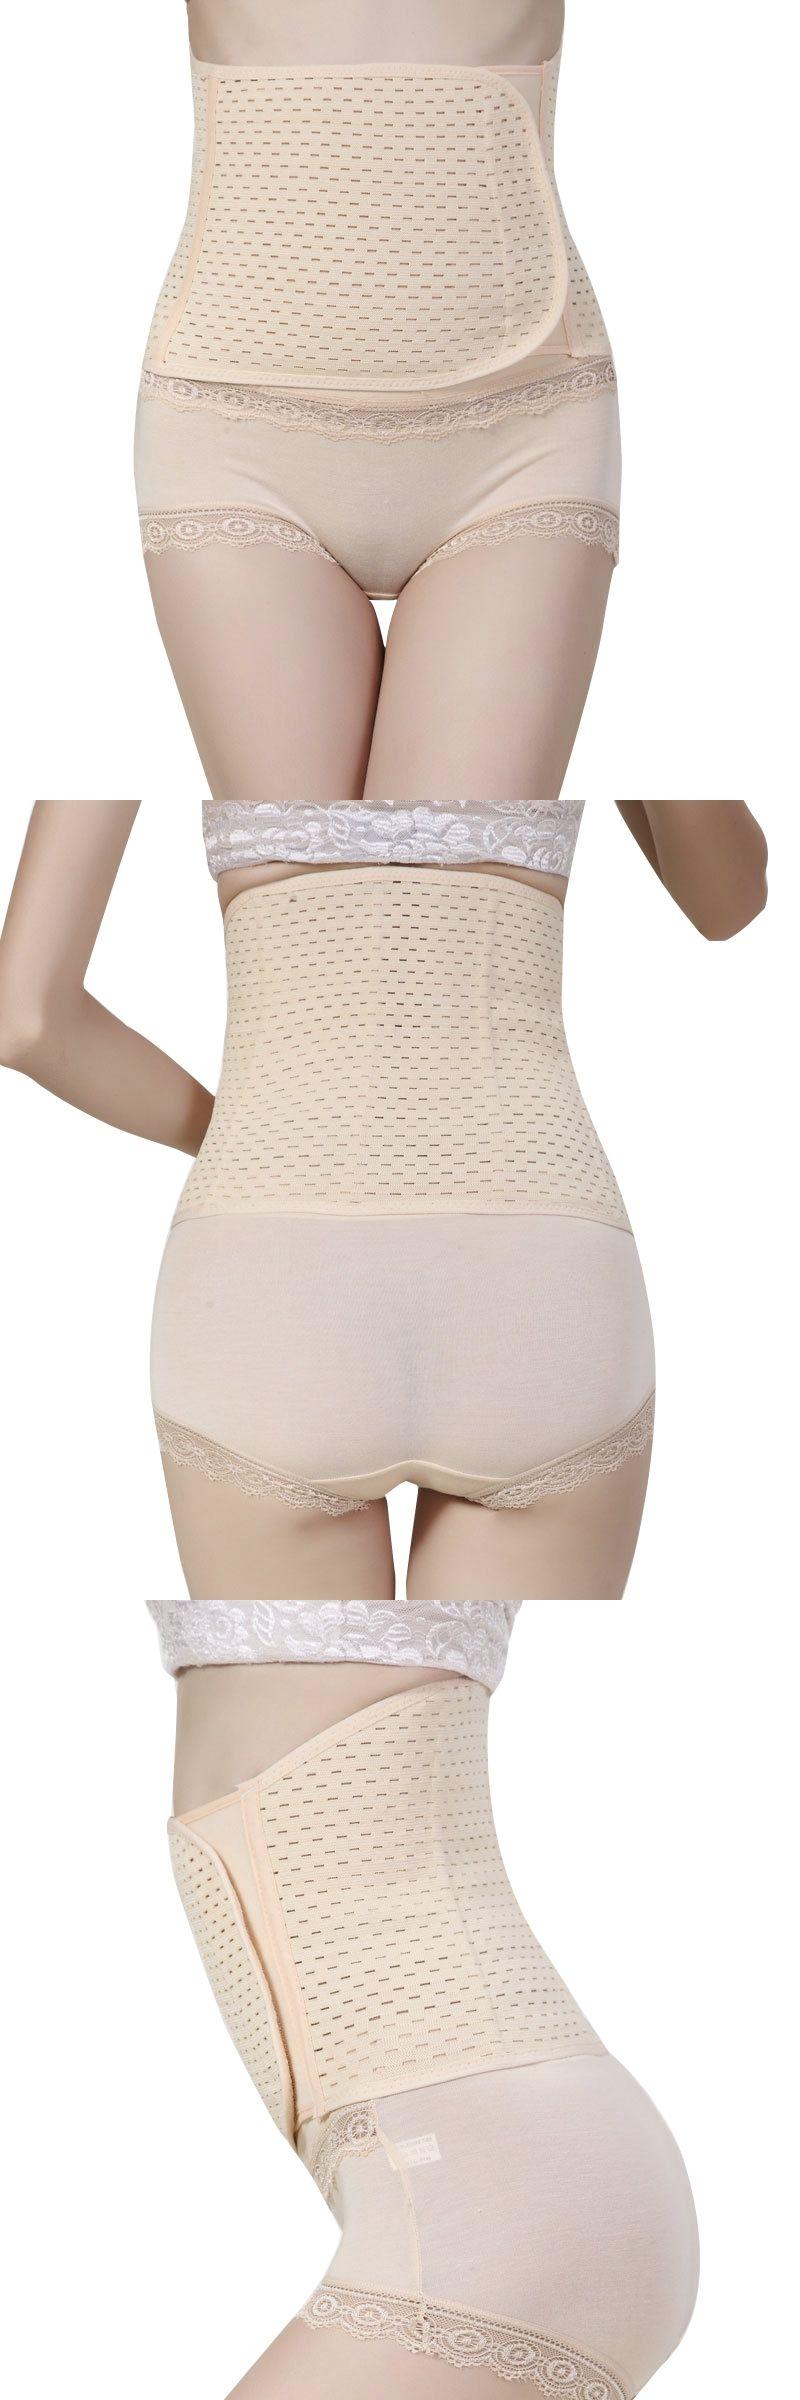 53a8d89188b71 Postpartum Maternity Belt Slimming Waist Corset Women Waist Training  Corsets Body Shaper women shapewear Pregnancy Belly